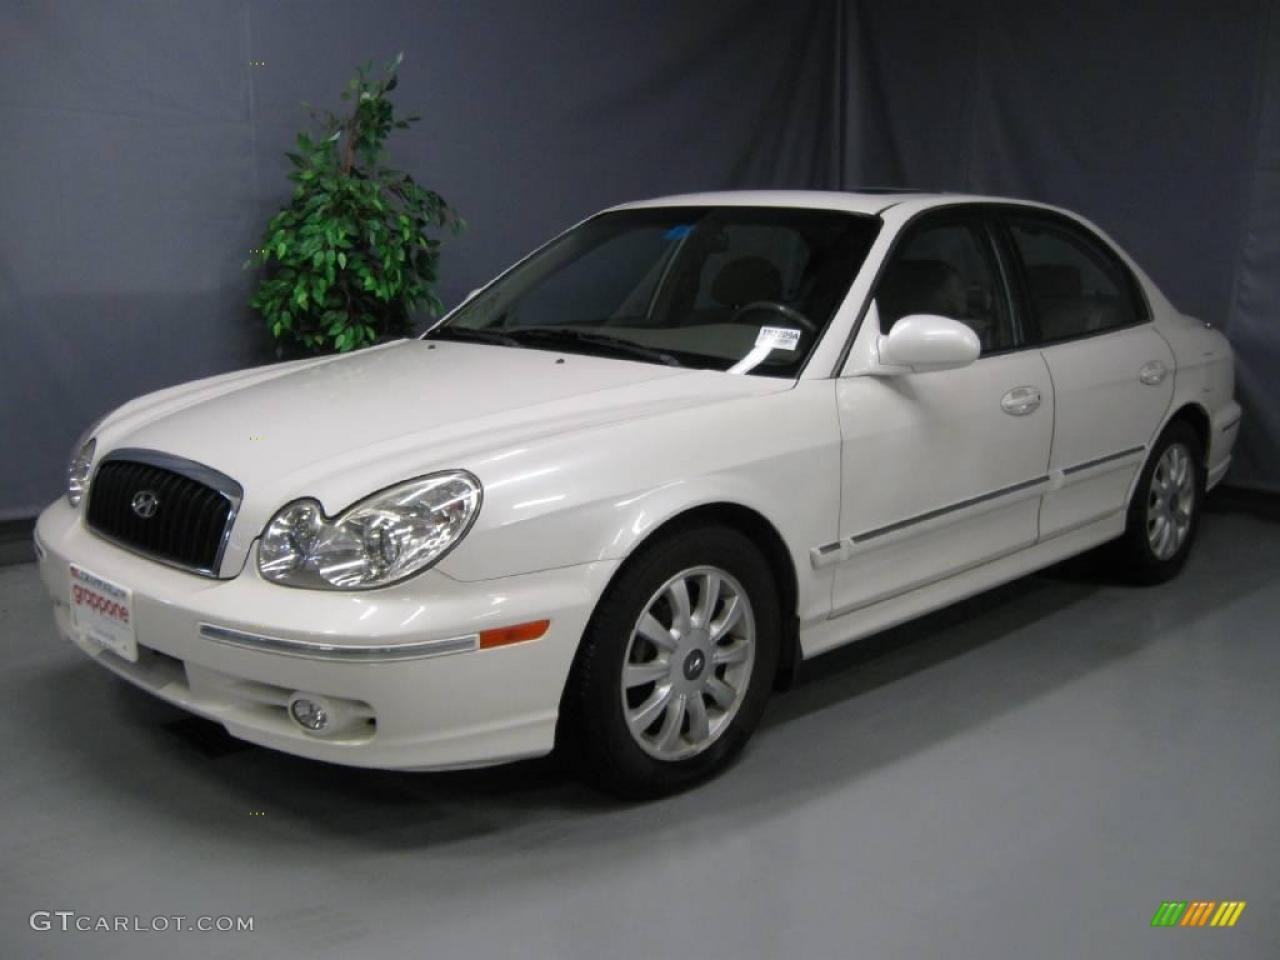 800 1024 1280 1600 Origin 2003 Hyundai Sonata ...